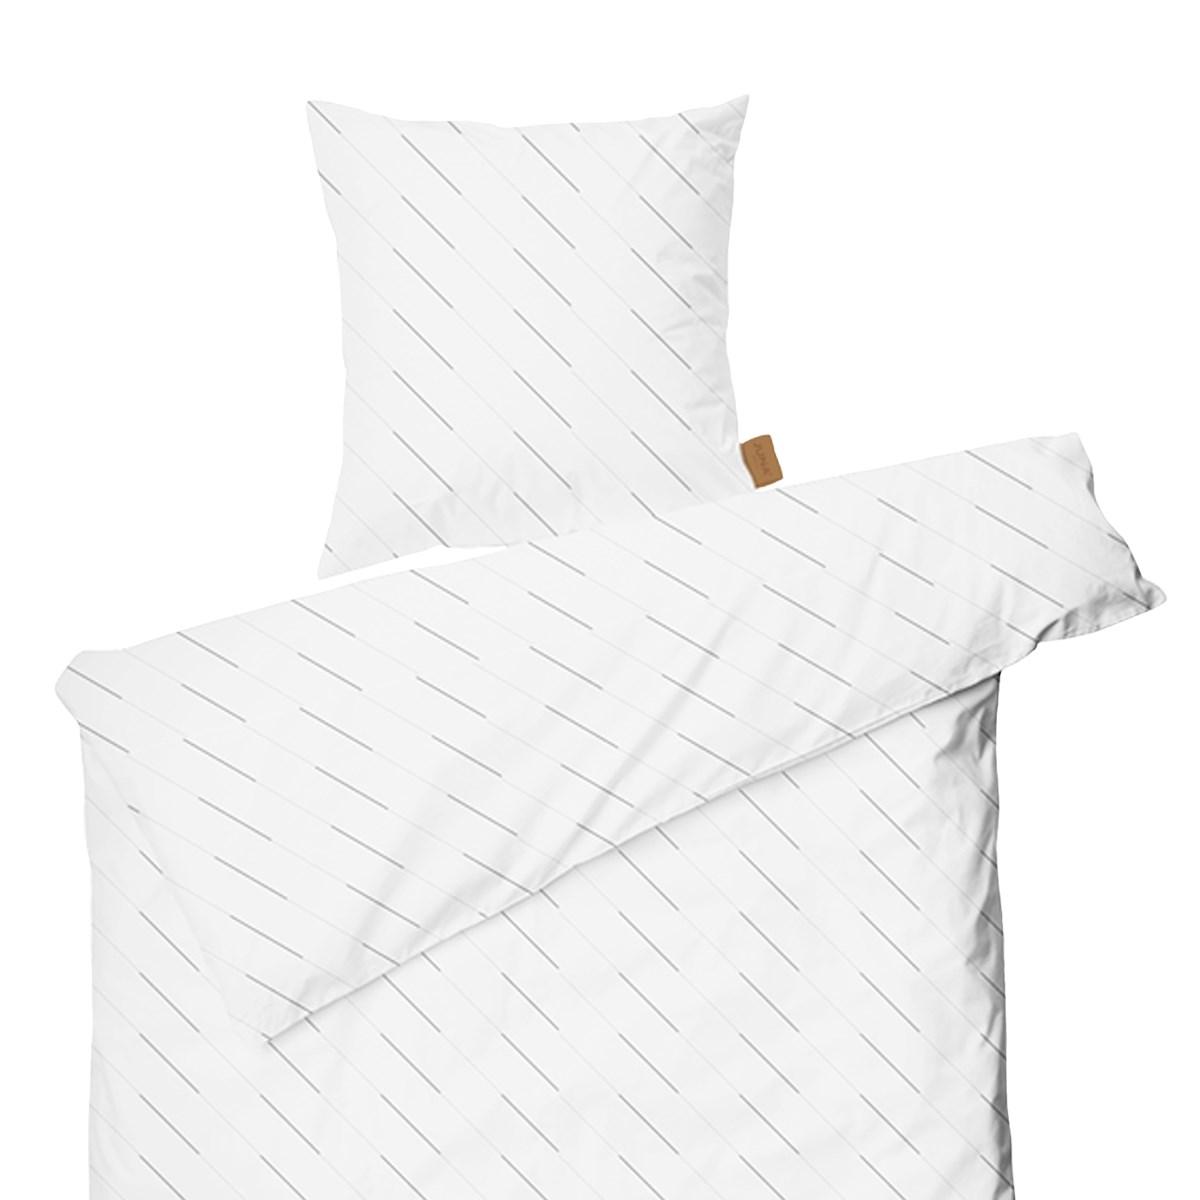 Splinterny Juna Rain, Sengesæt, 140x220, white/light grey sengetøj - Skiftselv.dk TL78